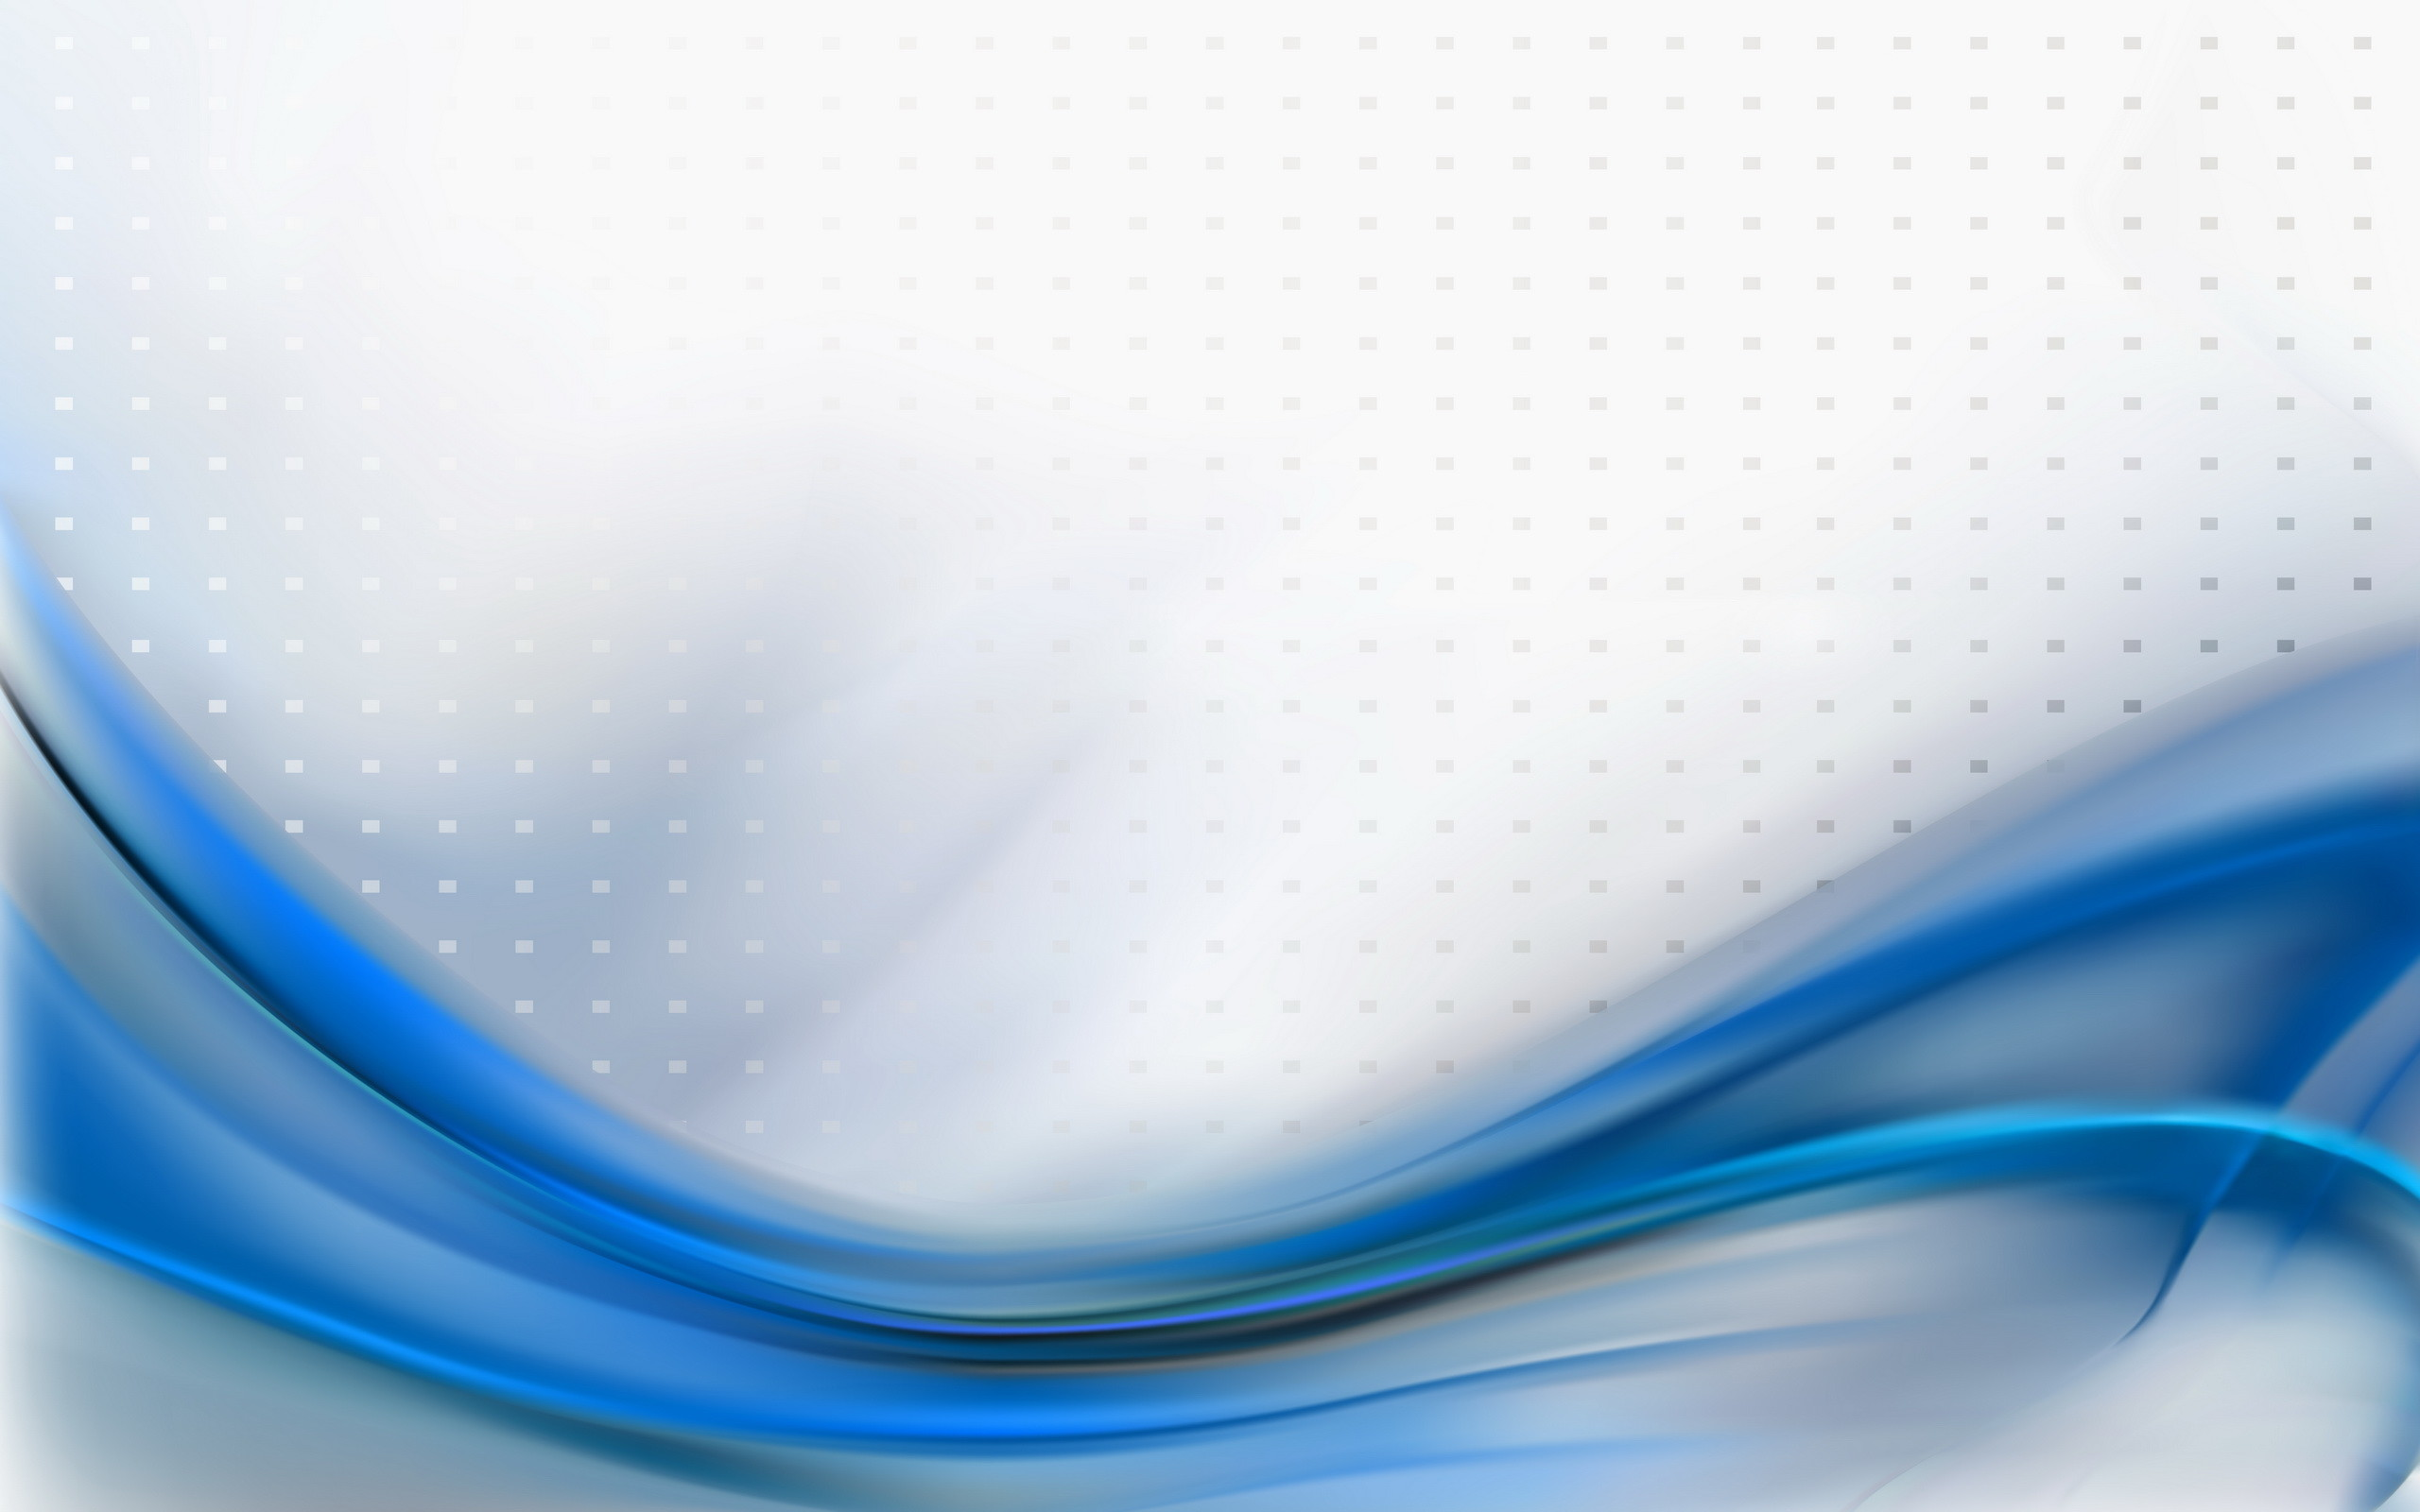 Blue Vector Backgrounds wallpaper – 1099327